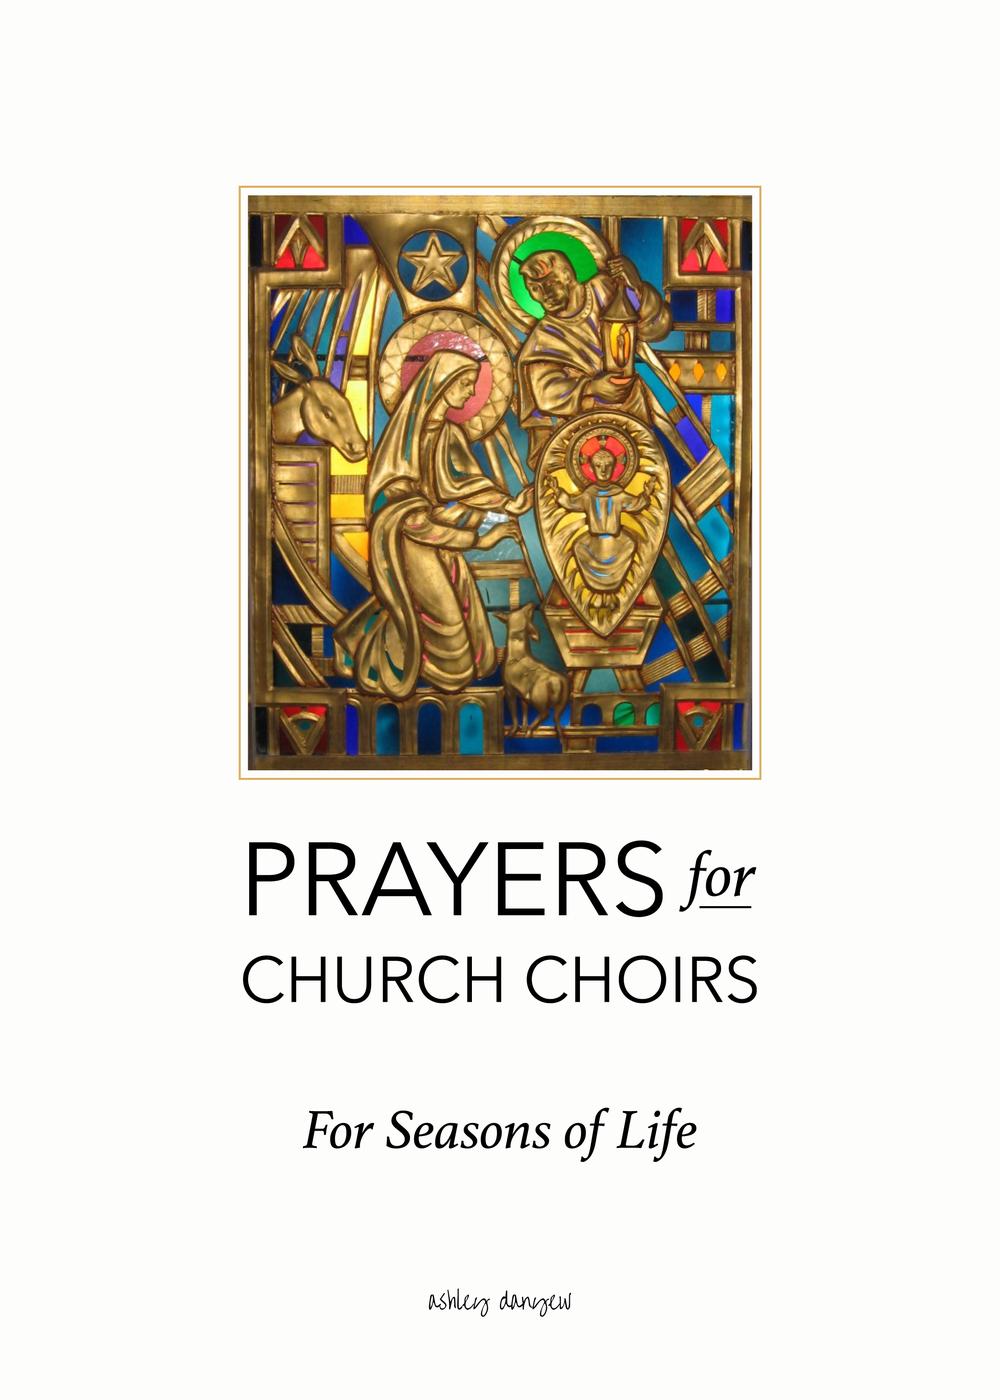 Prayers-for-Church-Choirs_Seasons-10.png